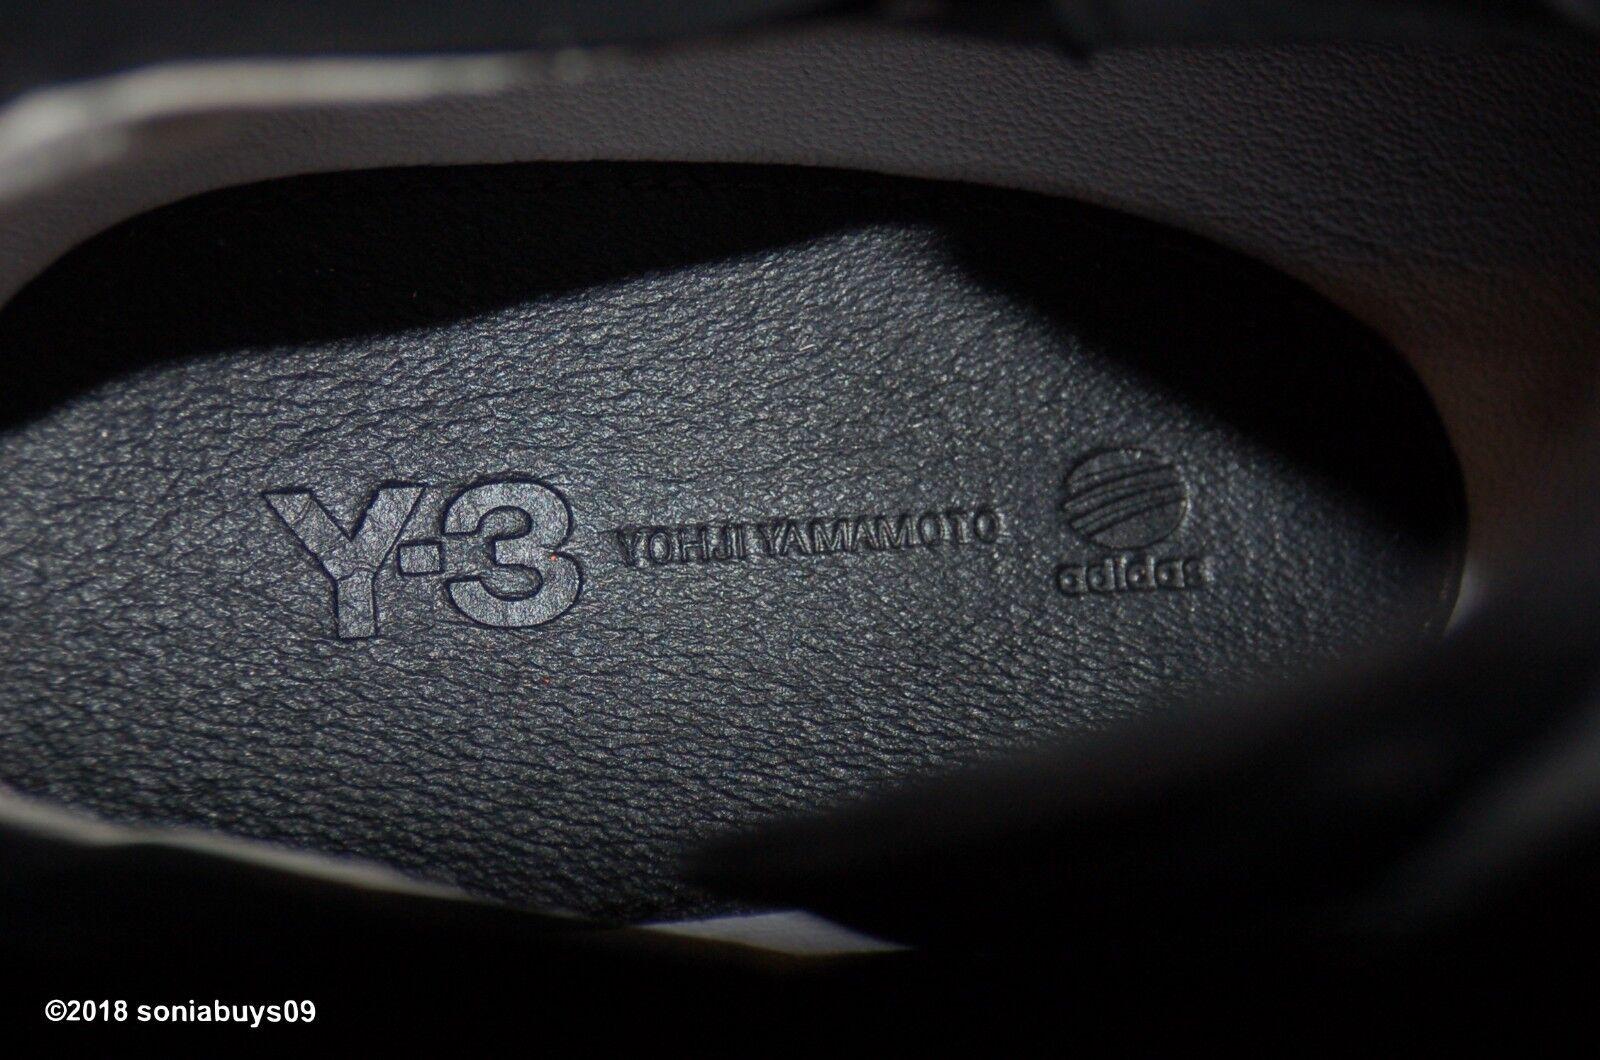 Adidas schwarz, frauen y-3 sukita fashion Turnschuhe, g63706, schwarz, Adidas us - größe 10. 51c9de